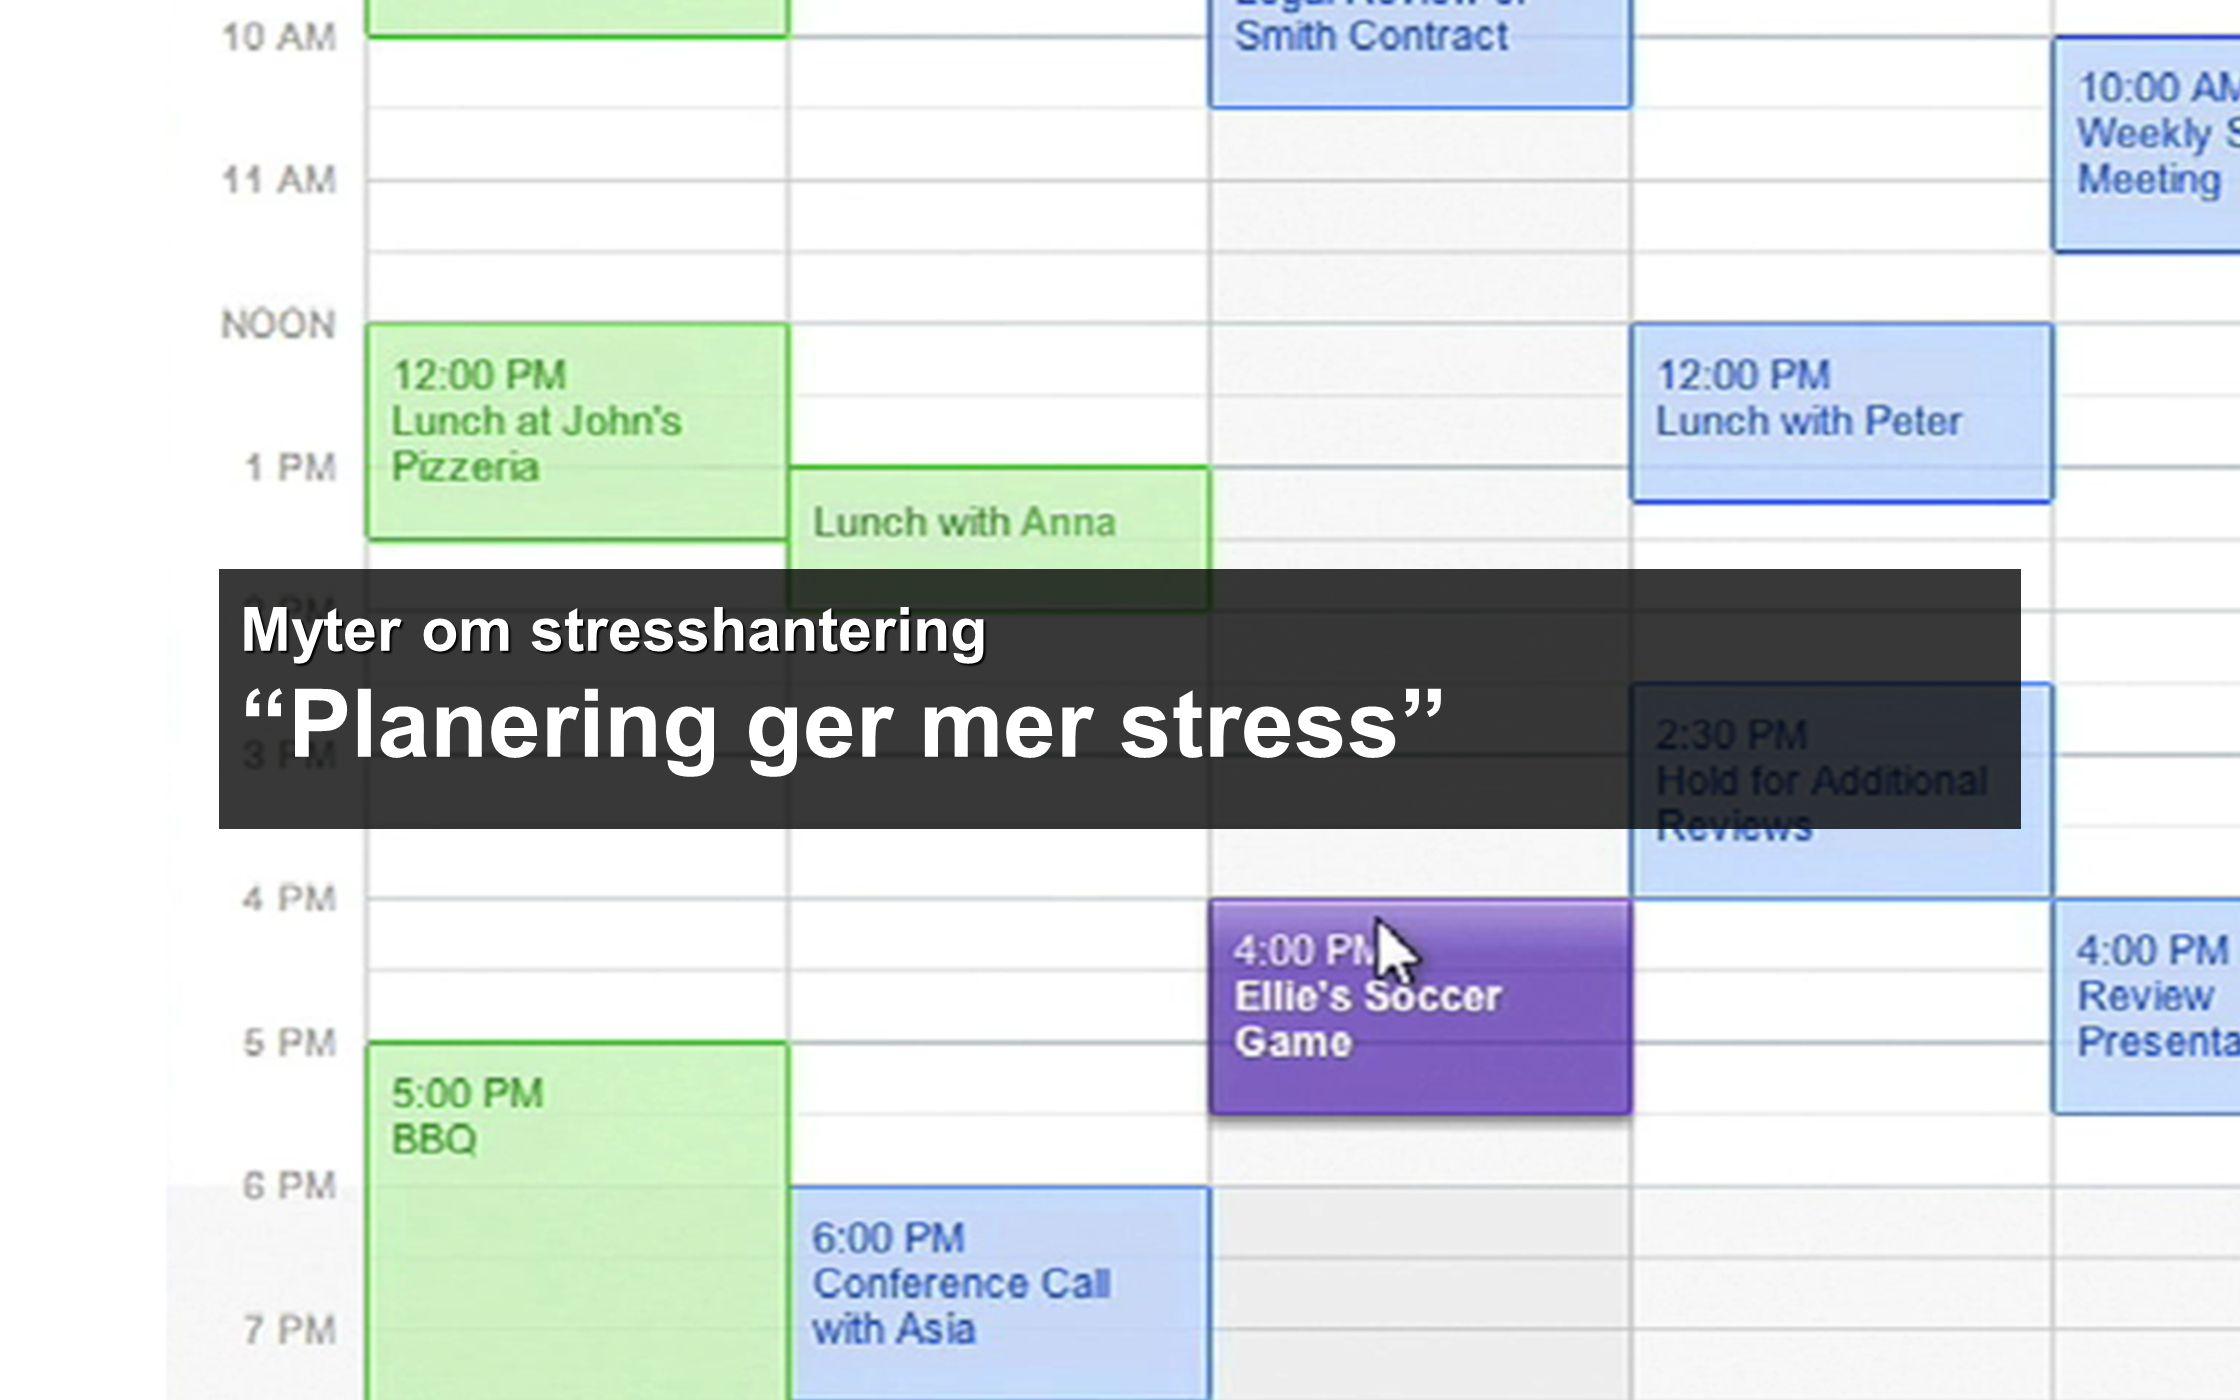 Myter om stresshantering Myter om stresshantering Planering ger mer stress